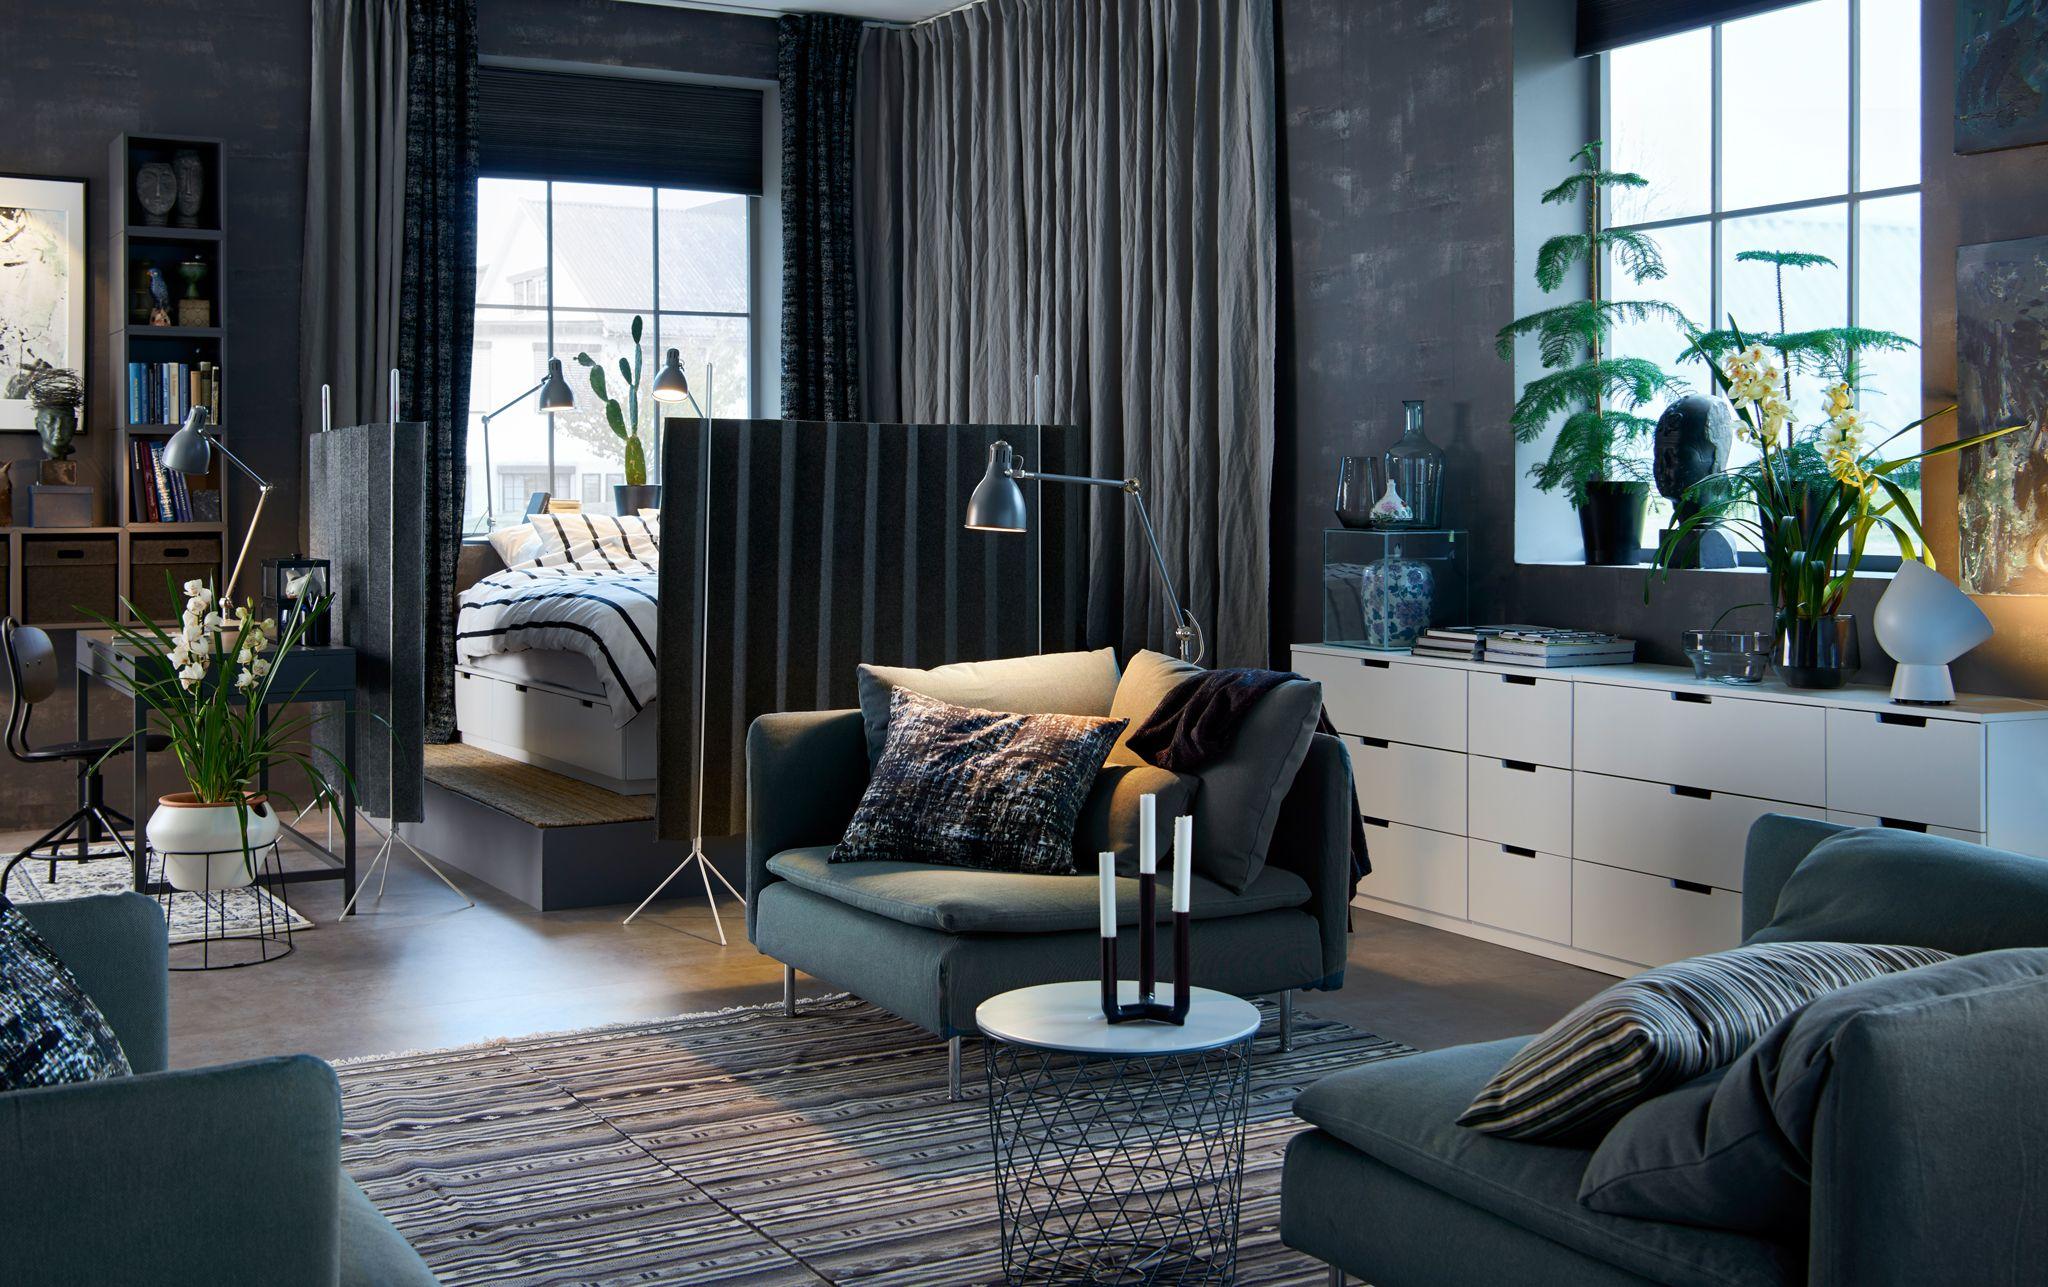 Bedroom Furniture & Ideas | IKEA | Design | Ikea bedroom